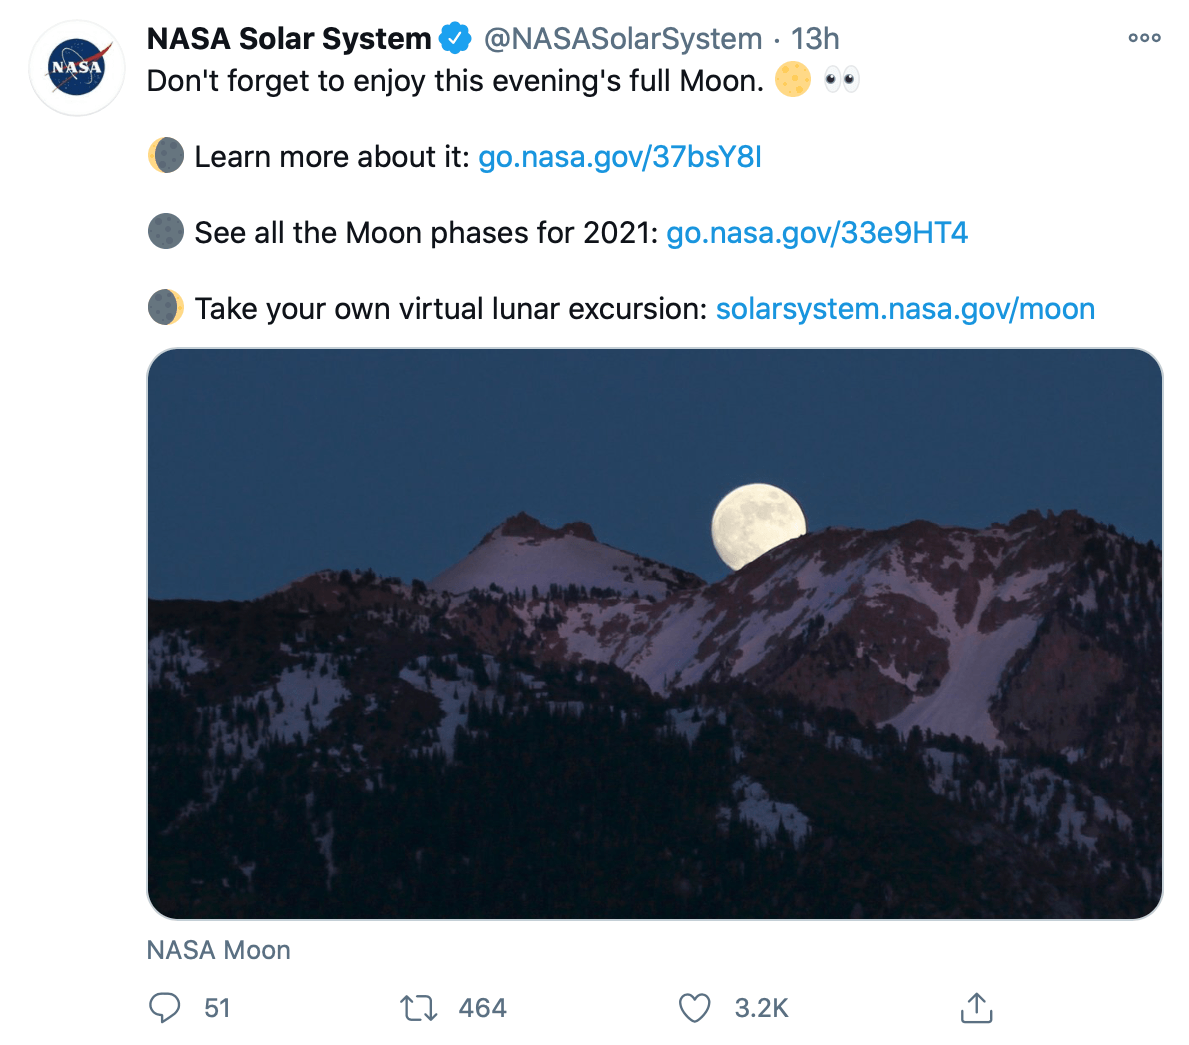 Tweet by @NASASolarSystem providing educational information and multiple links